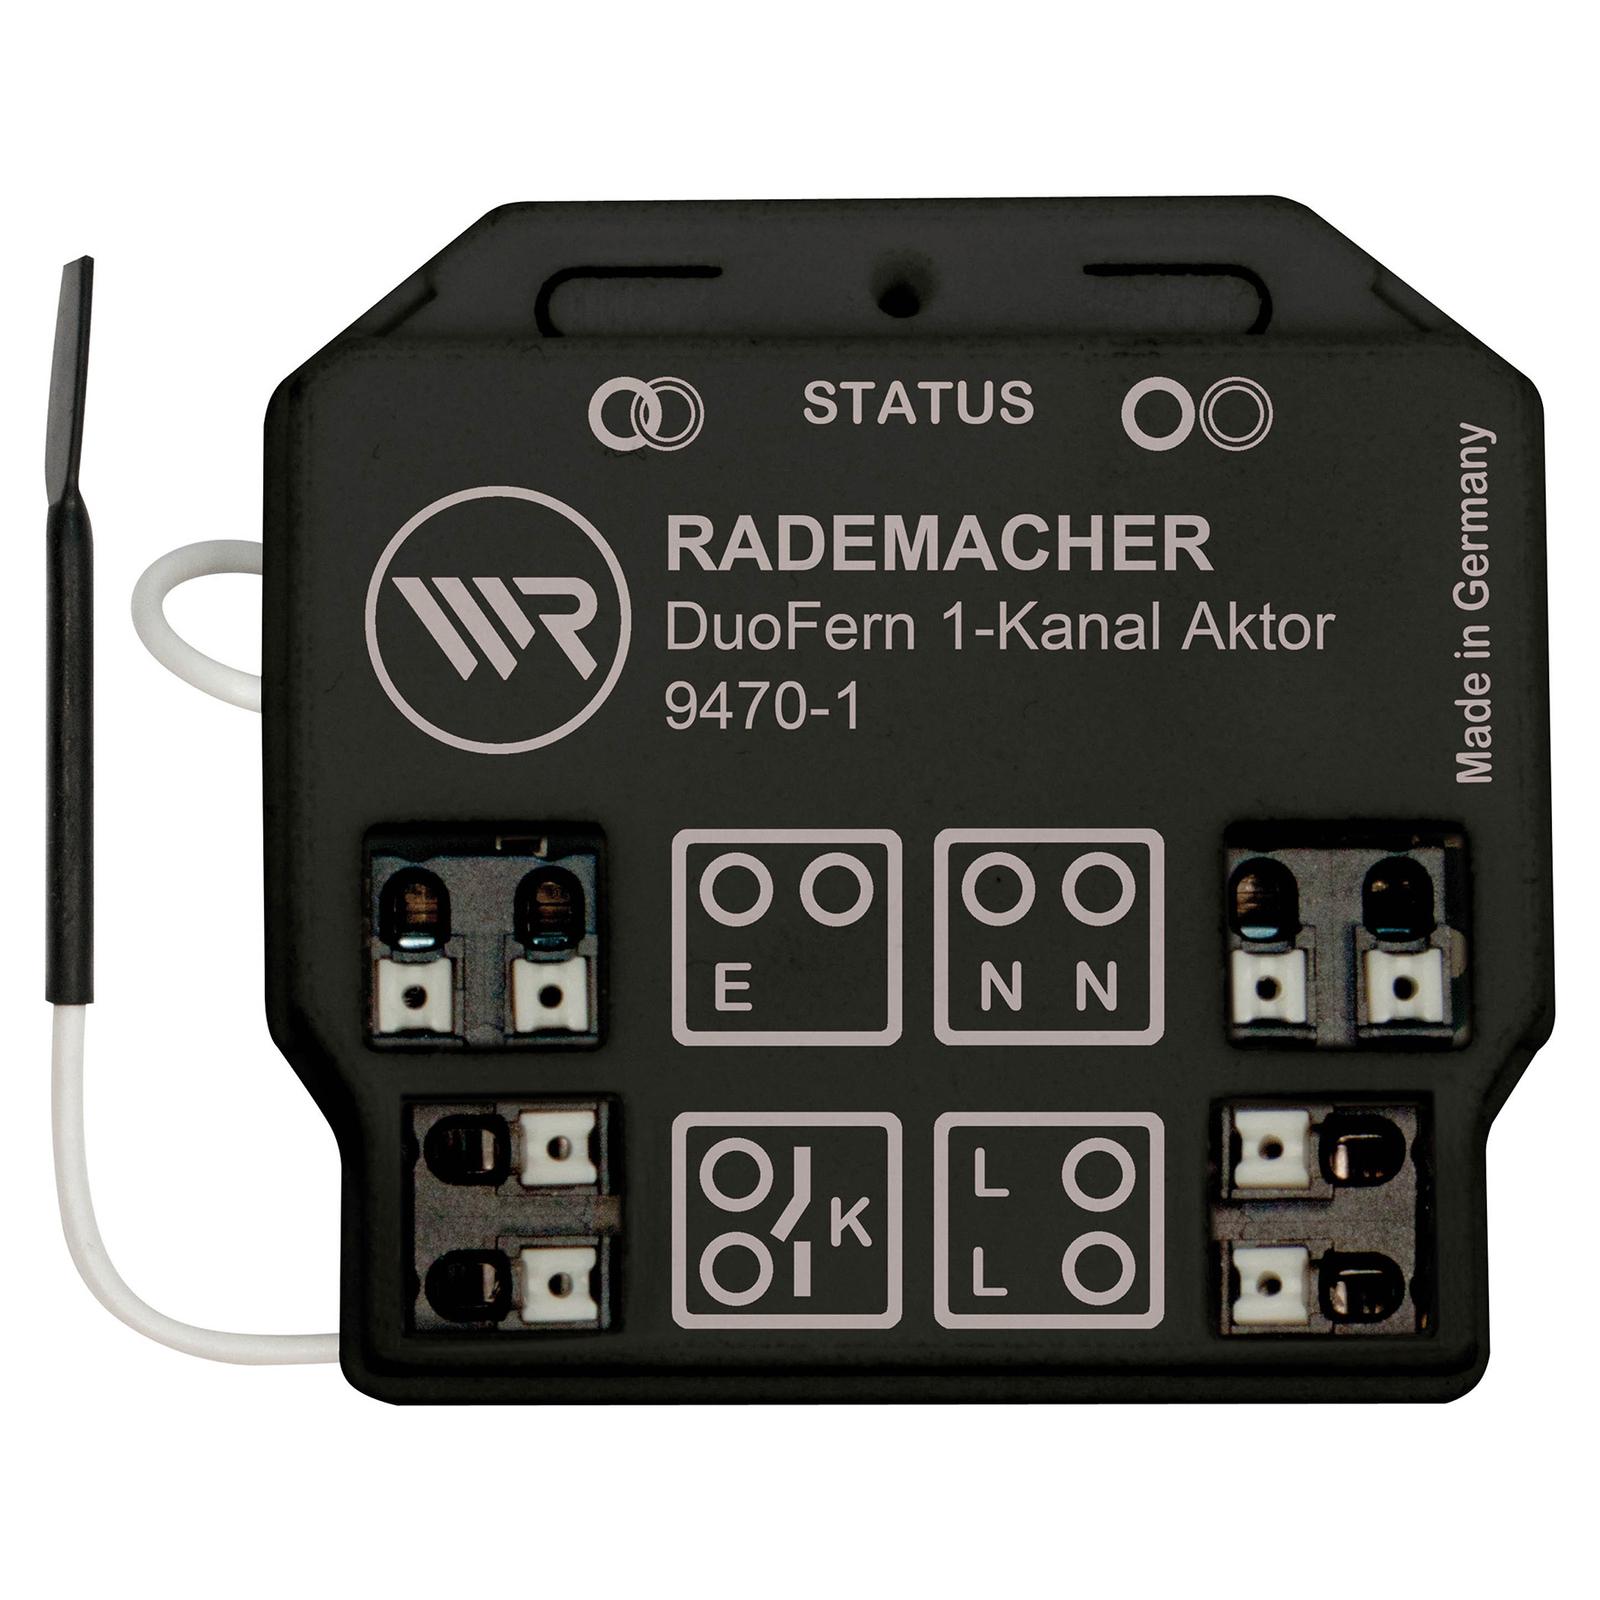 Rademacher DuoFern universal actuator 1 x 3,600W_8038045_1